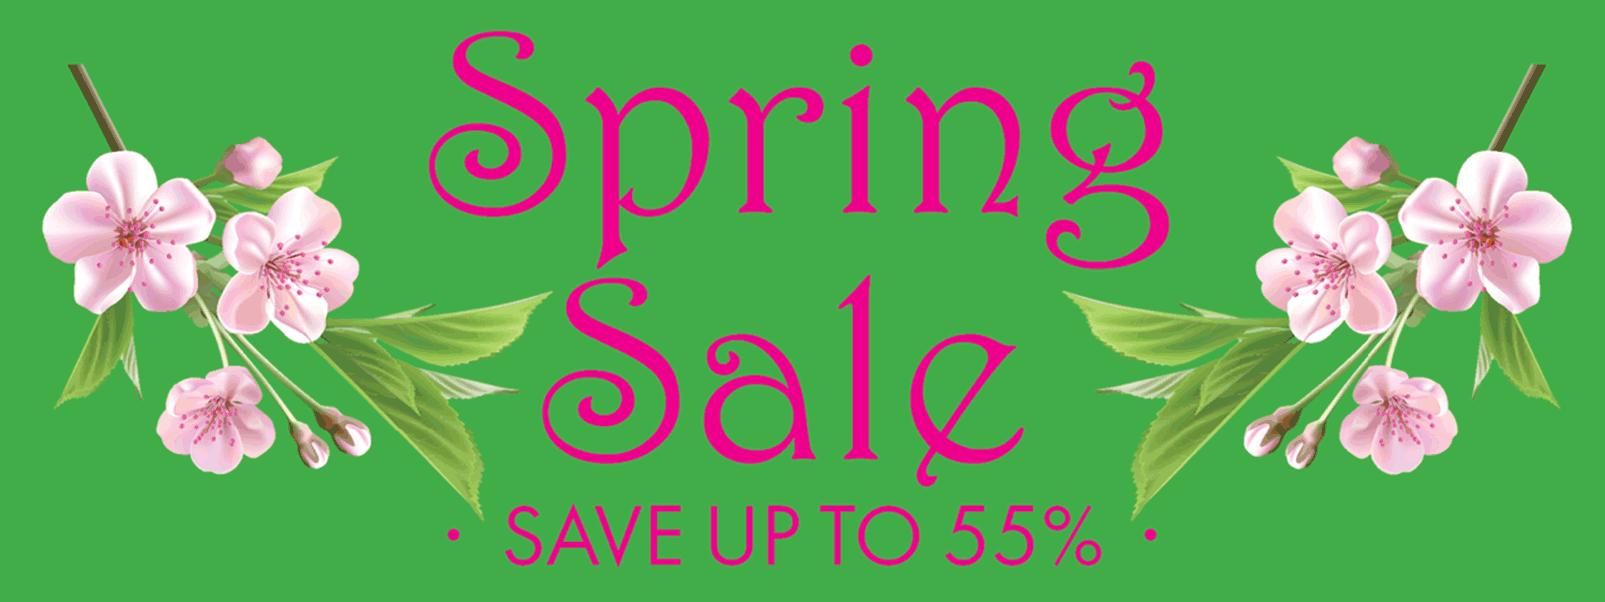 spring-sale-2017-banner-f